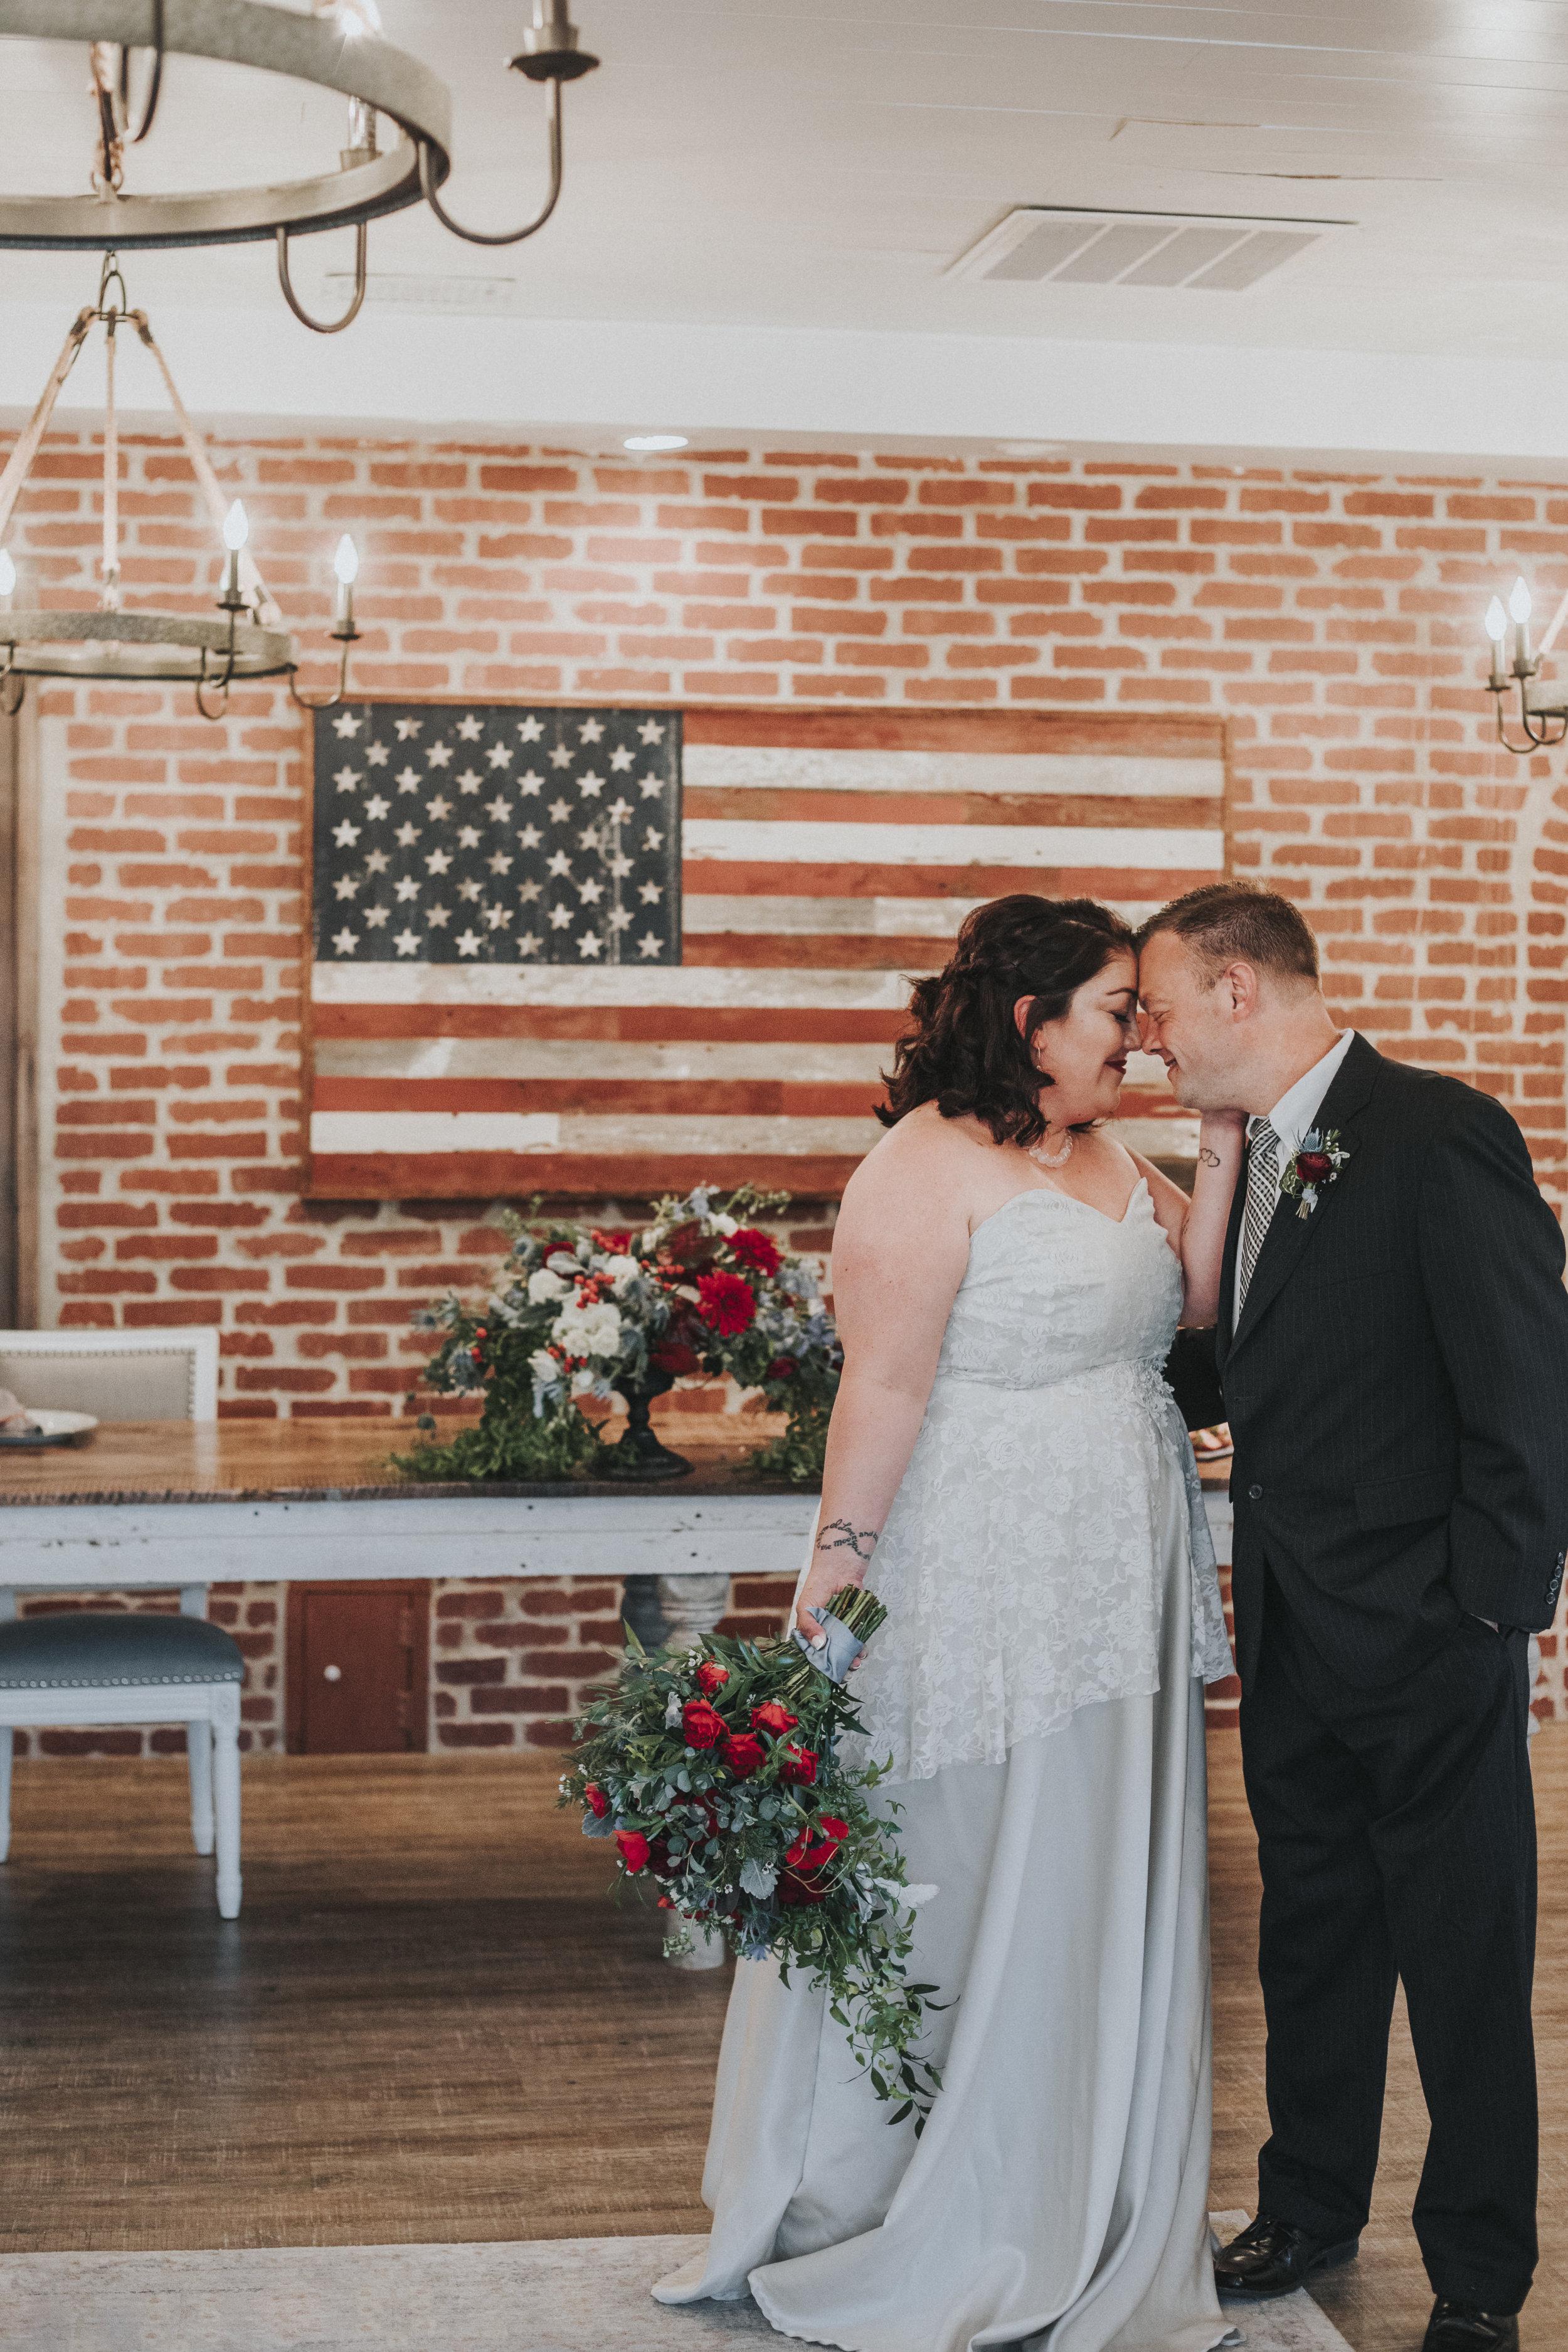 94 midwest-colorado-nebraska-elopement-photography-gretna-turtledoves.jpg